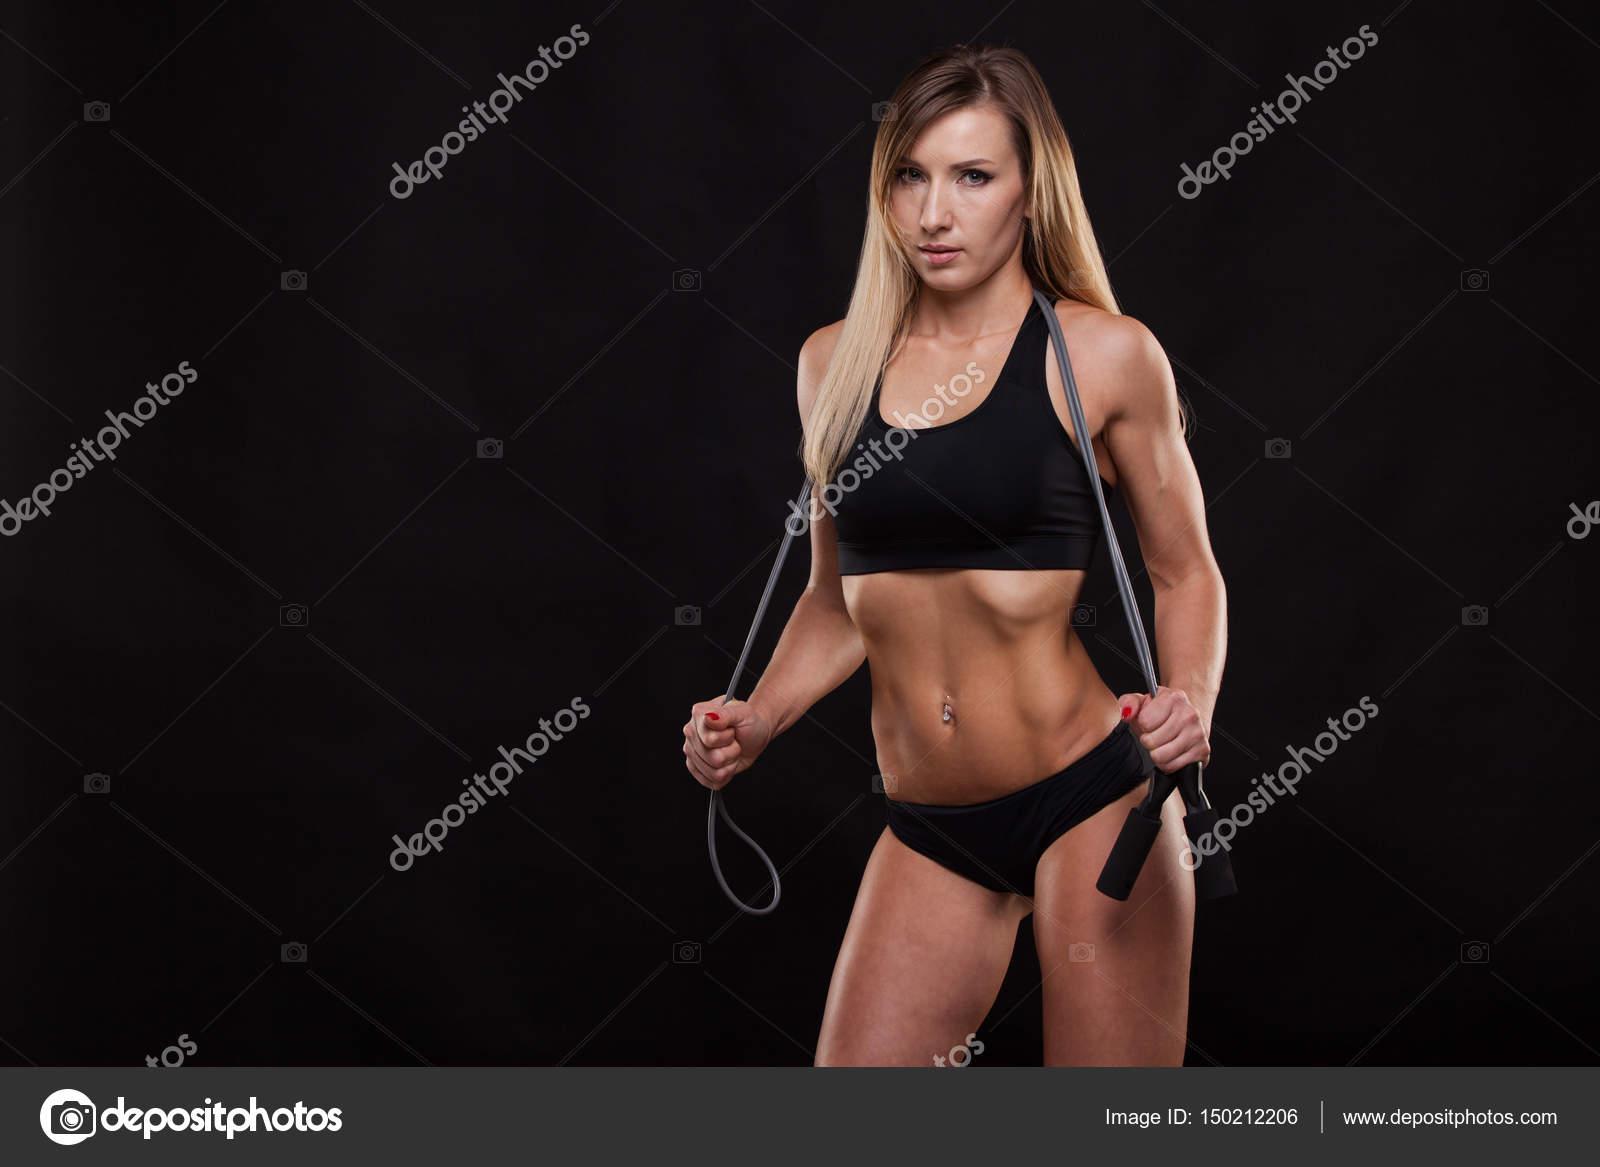 Bilder schöne Fitness Frau